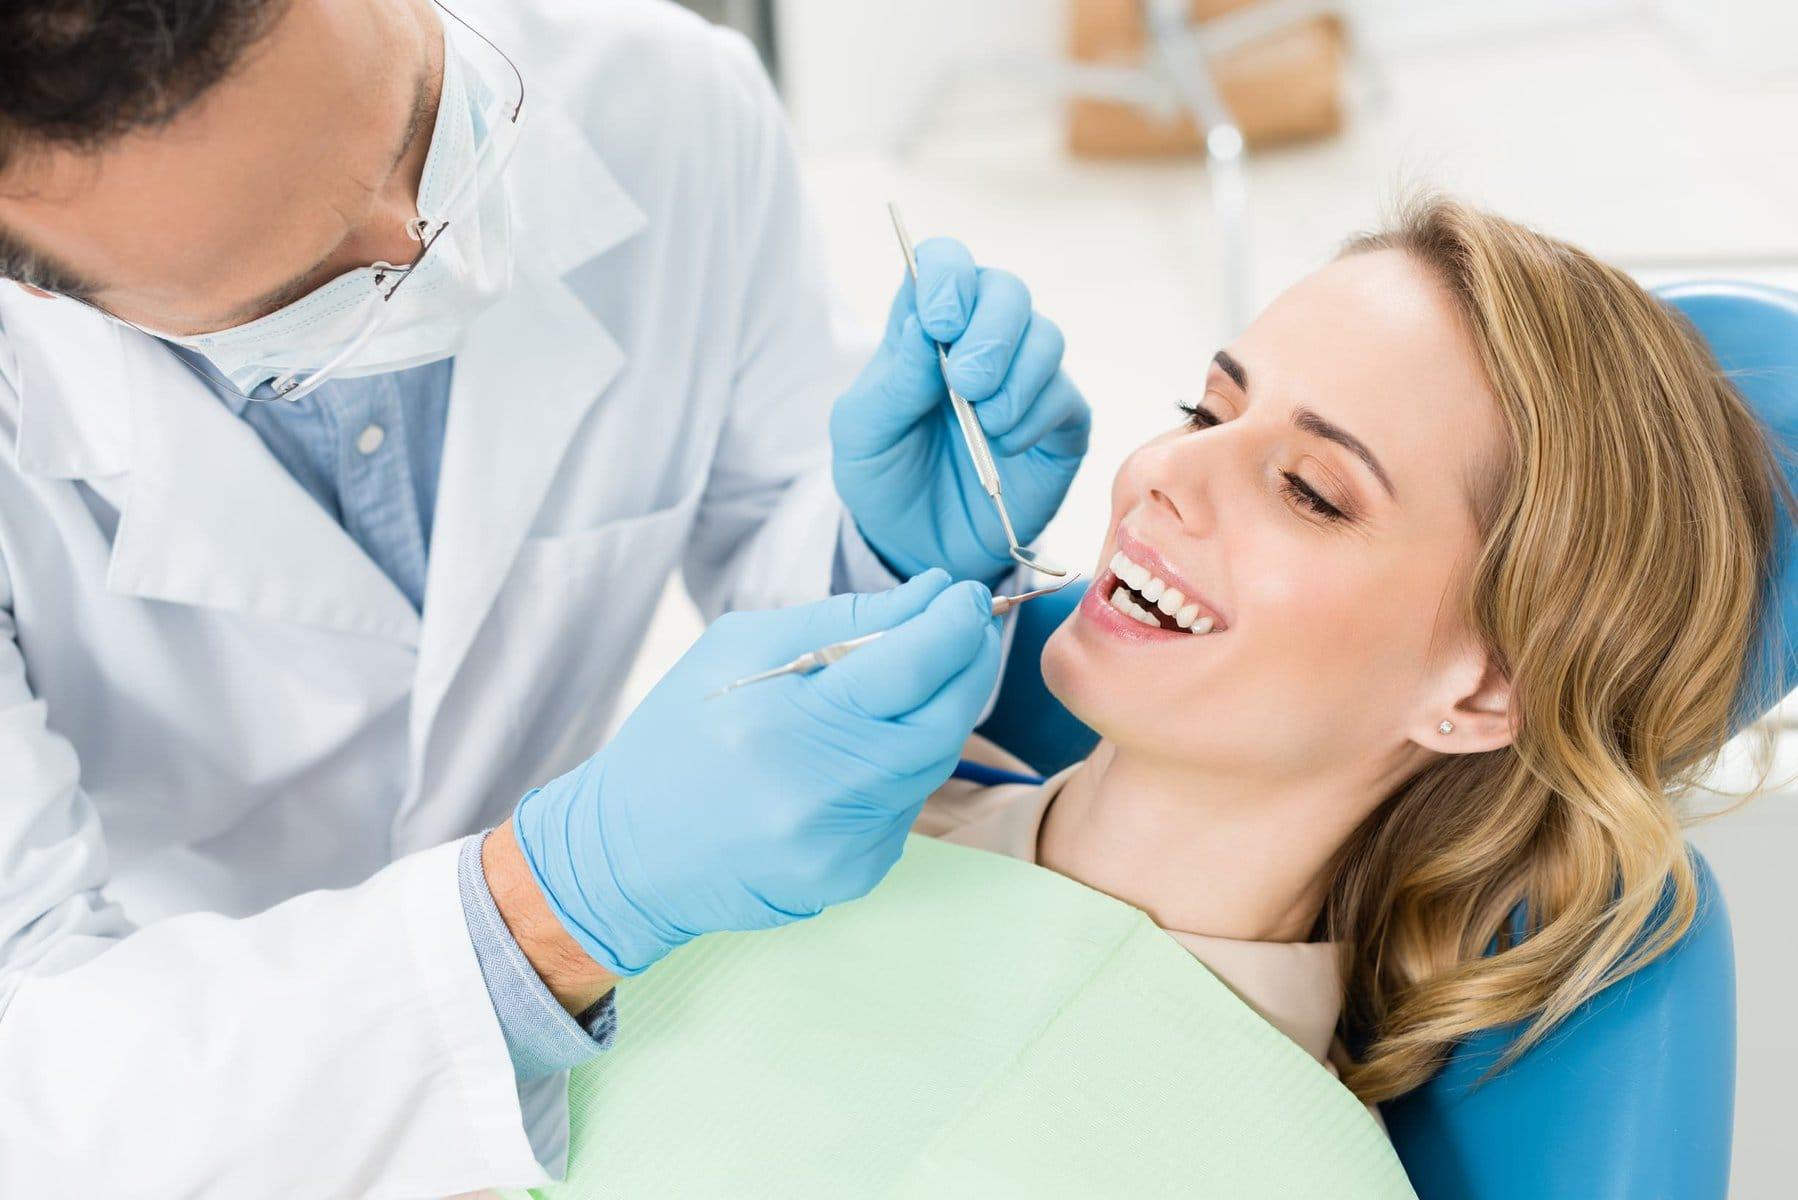 https://osemdental.com/wp-content/uploads/2021/01/Mostove-doctor-treats-patient-teeth-in-modern-dental-clini-F46KD88.jpg